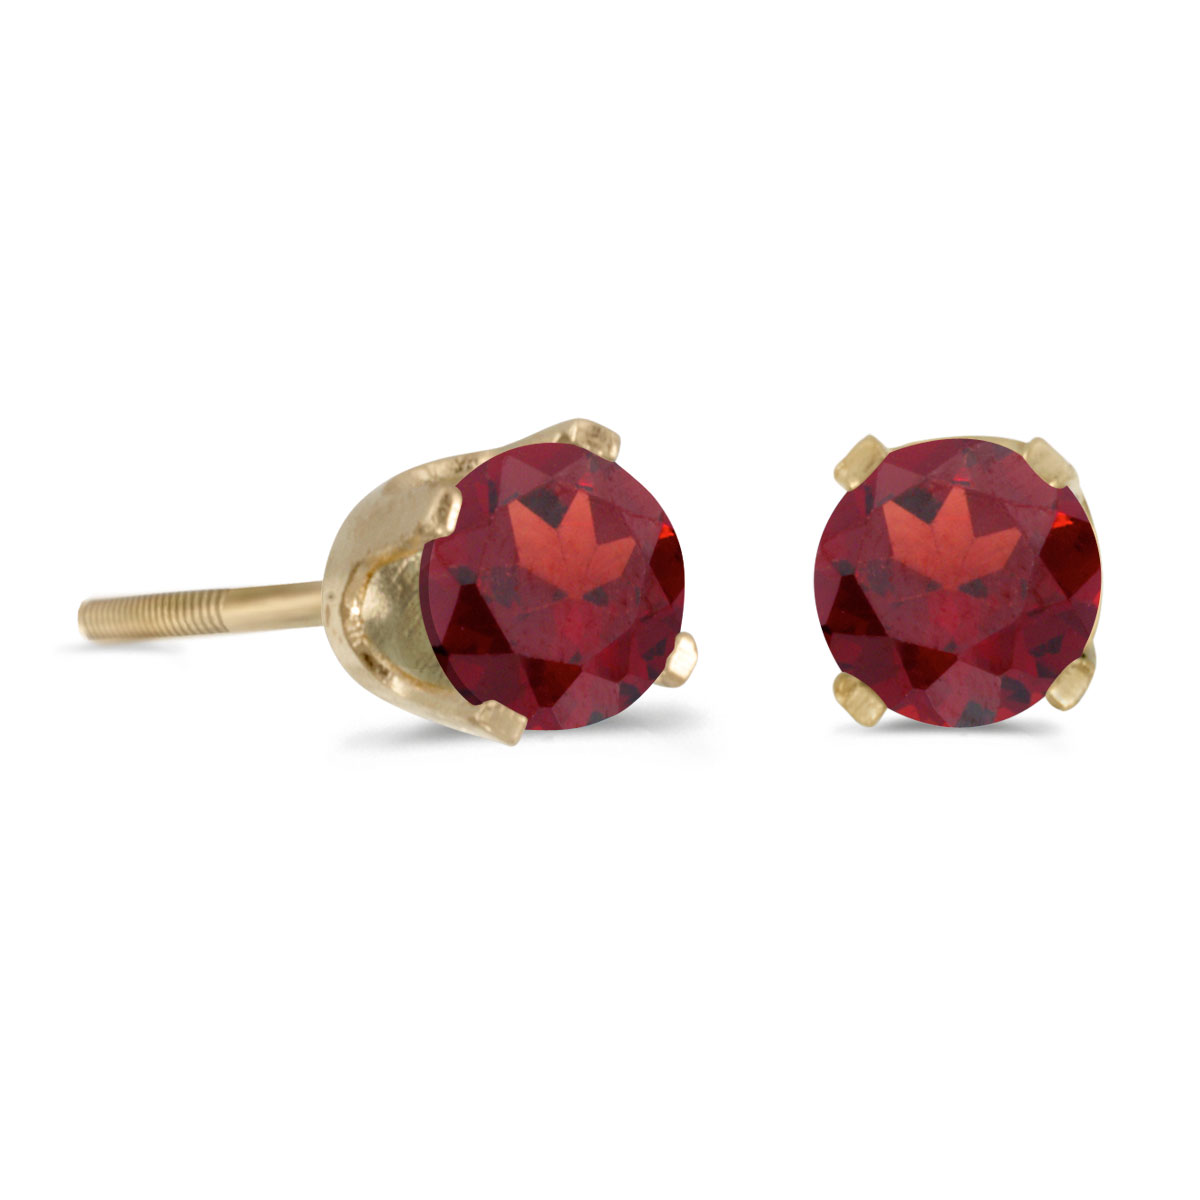 4mm Pink Garnet Screw Back Studs White Gold or Yellow Gold Screwbacks Platinum or 14k Gold Screw Back Earrings with Rhodolite Garnet